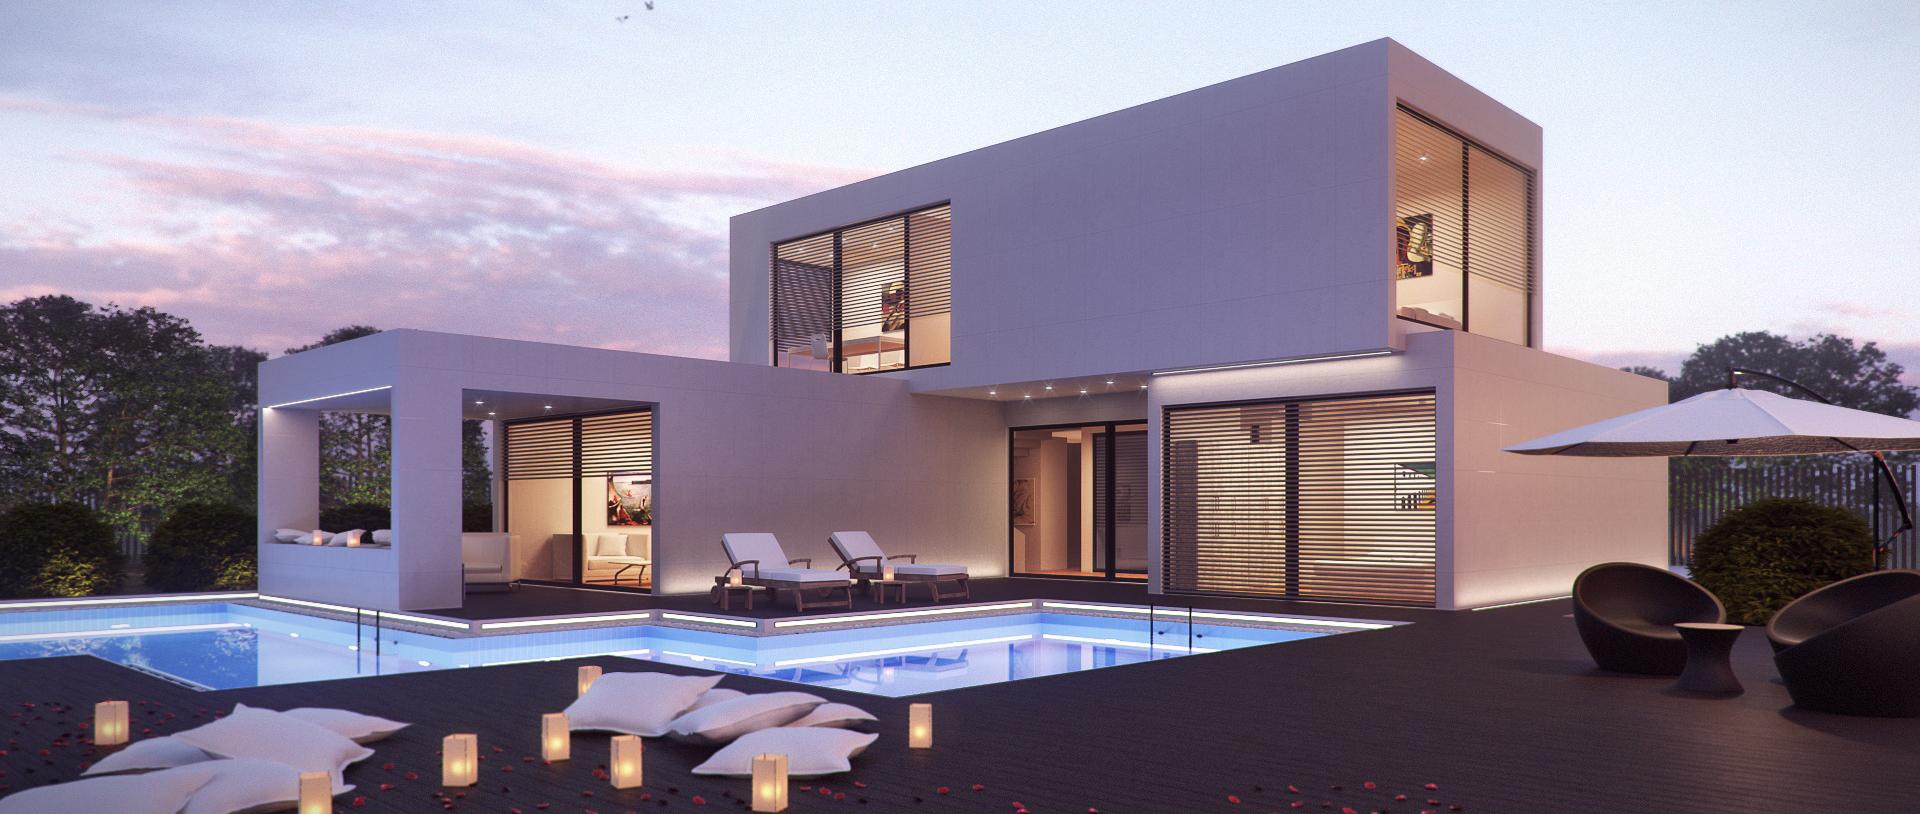 modern house mortgage broker ollive orleans